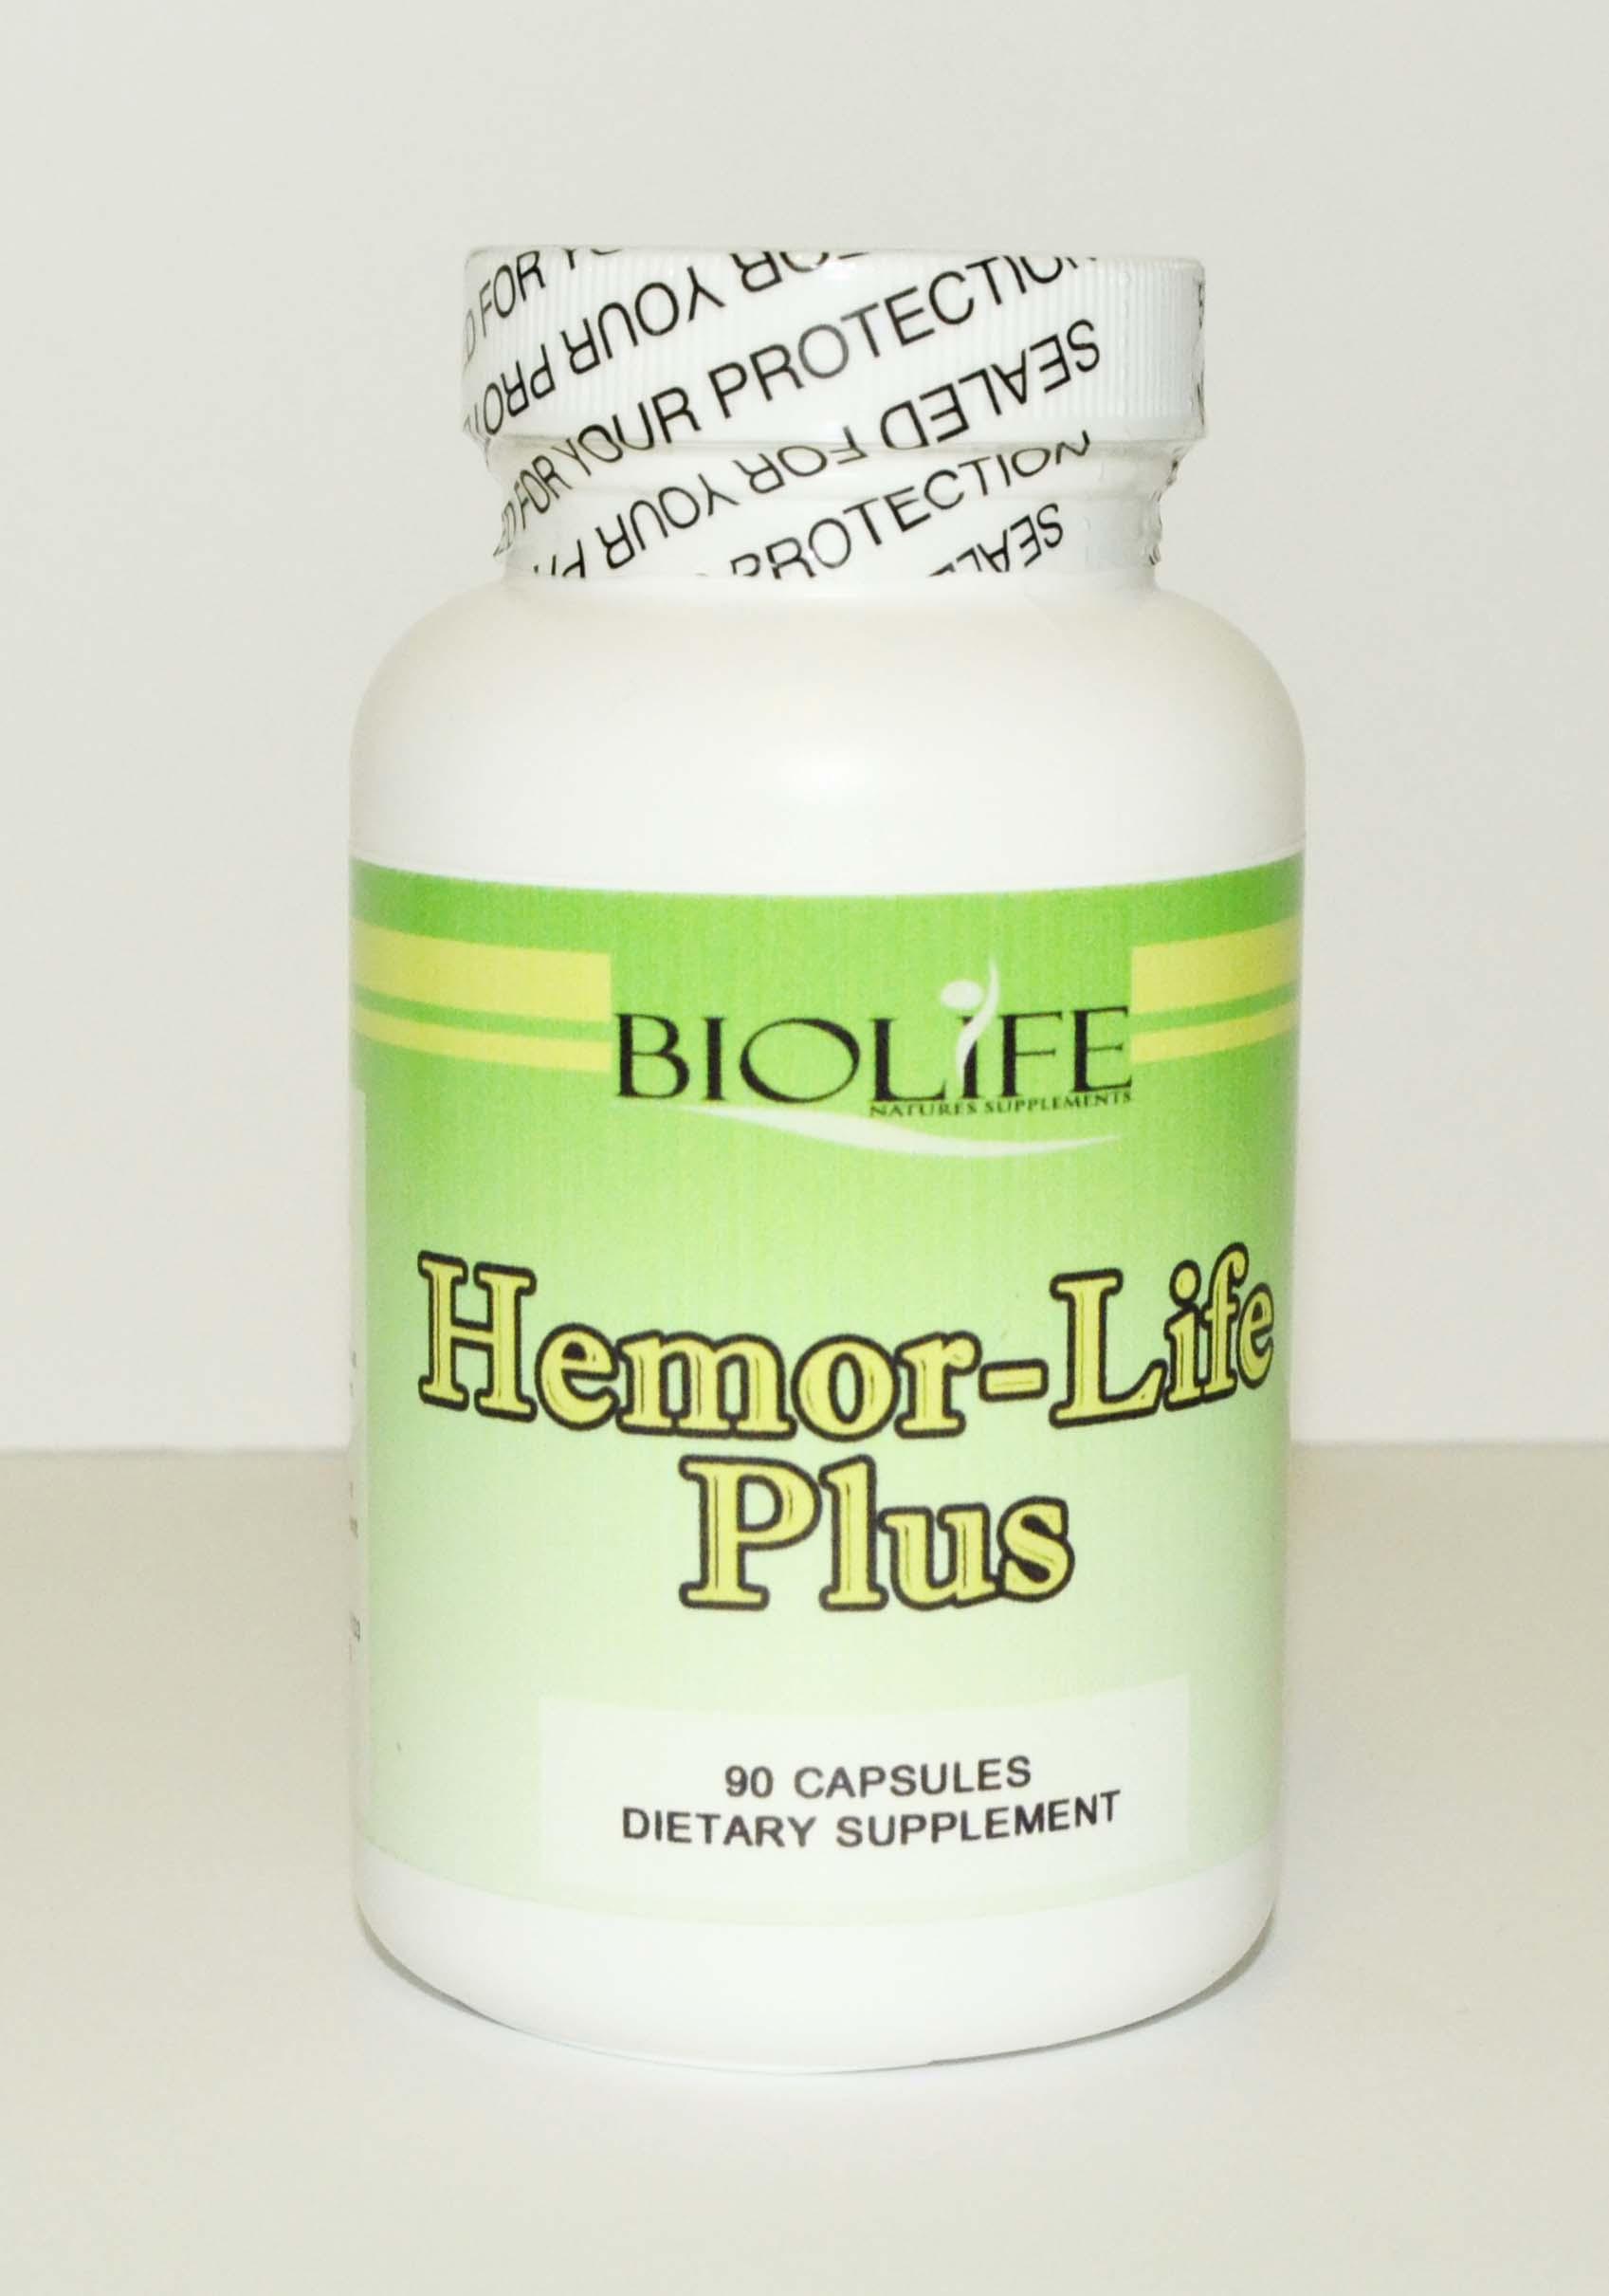 Hemor-Life Plus